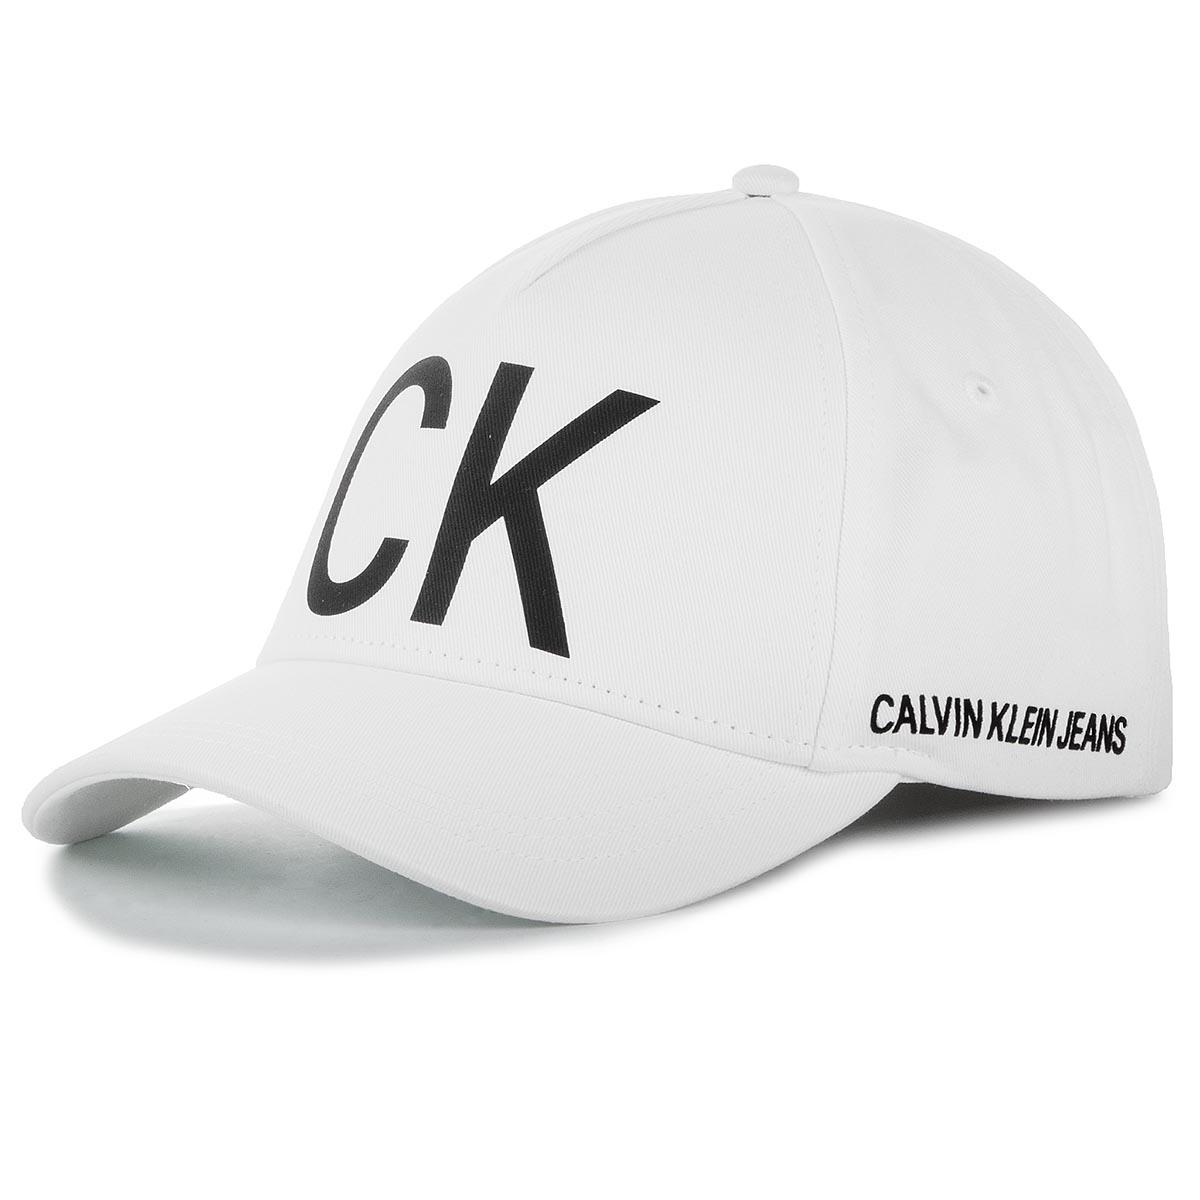 536759abb Šiltovka CALVIN KLEIN JEANS - J Ck Jeans Cap M K50K504872 102 - Glami.sk